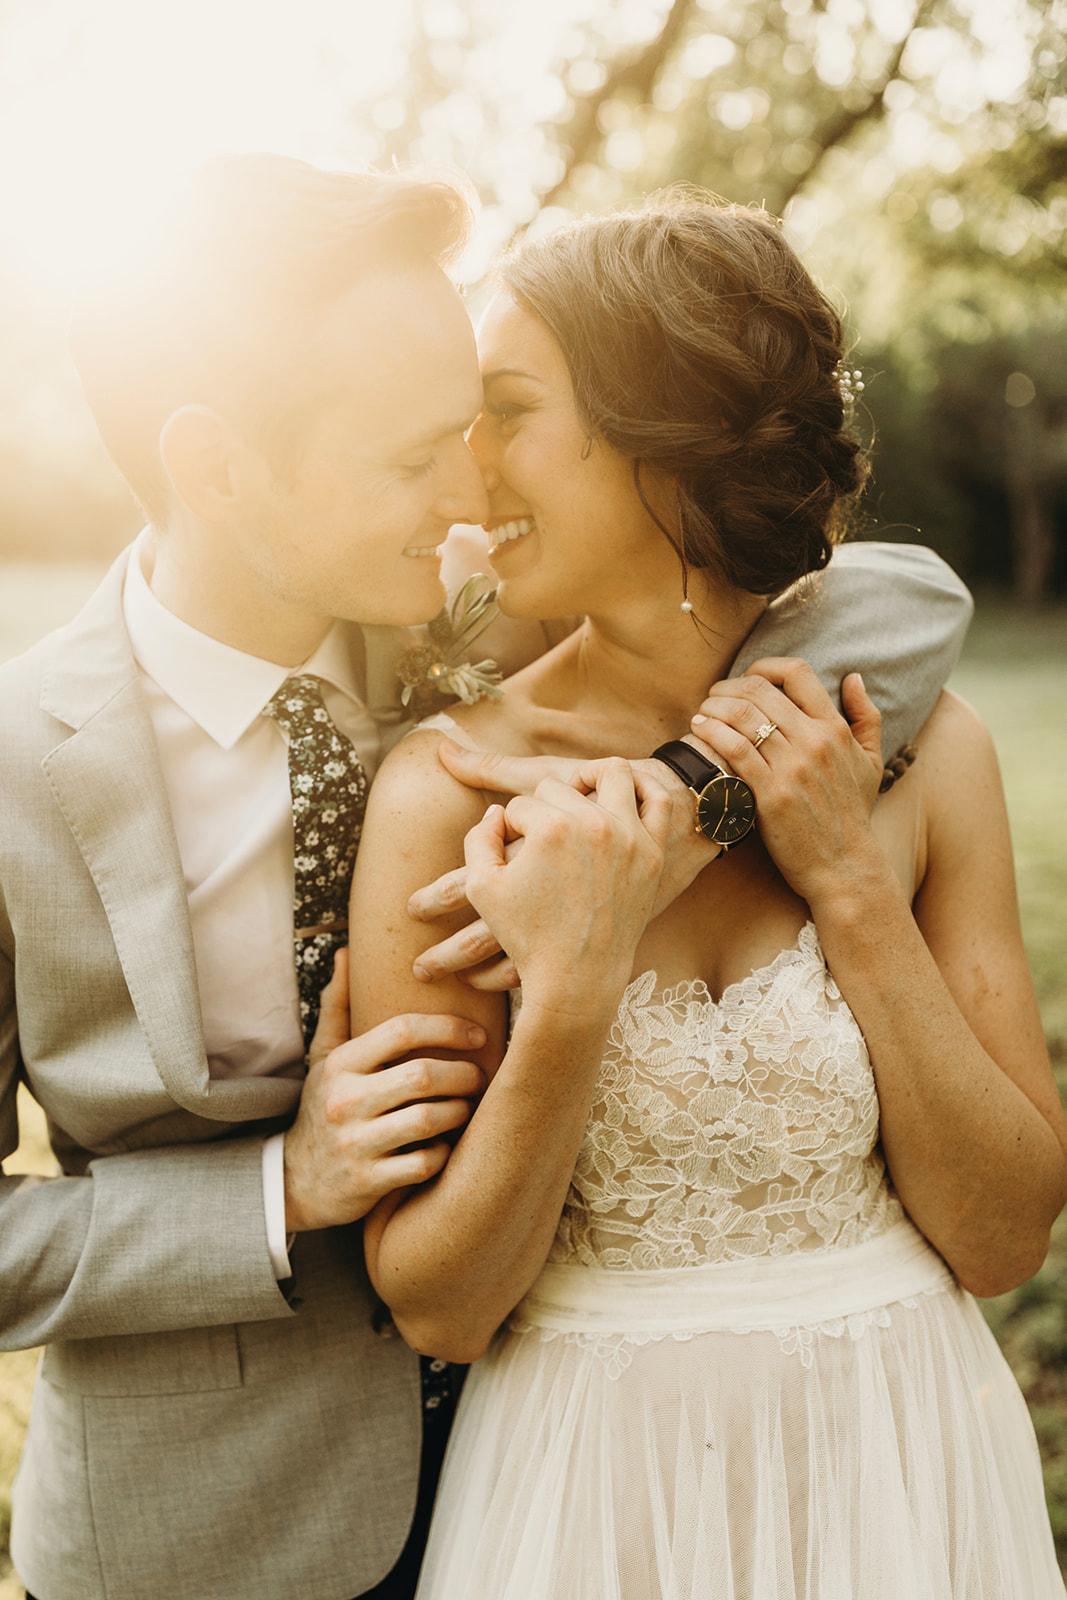 austin-wedding-lindsey-bryce-510.jpg